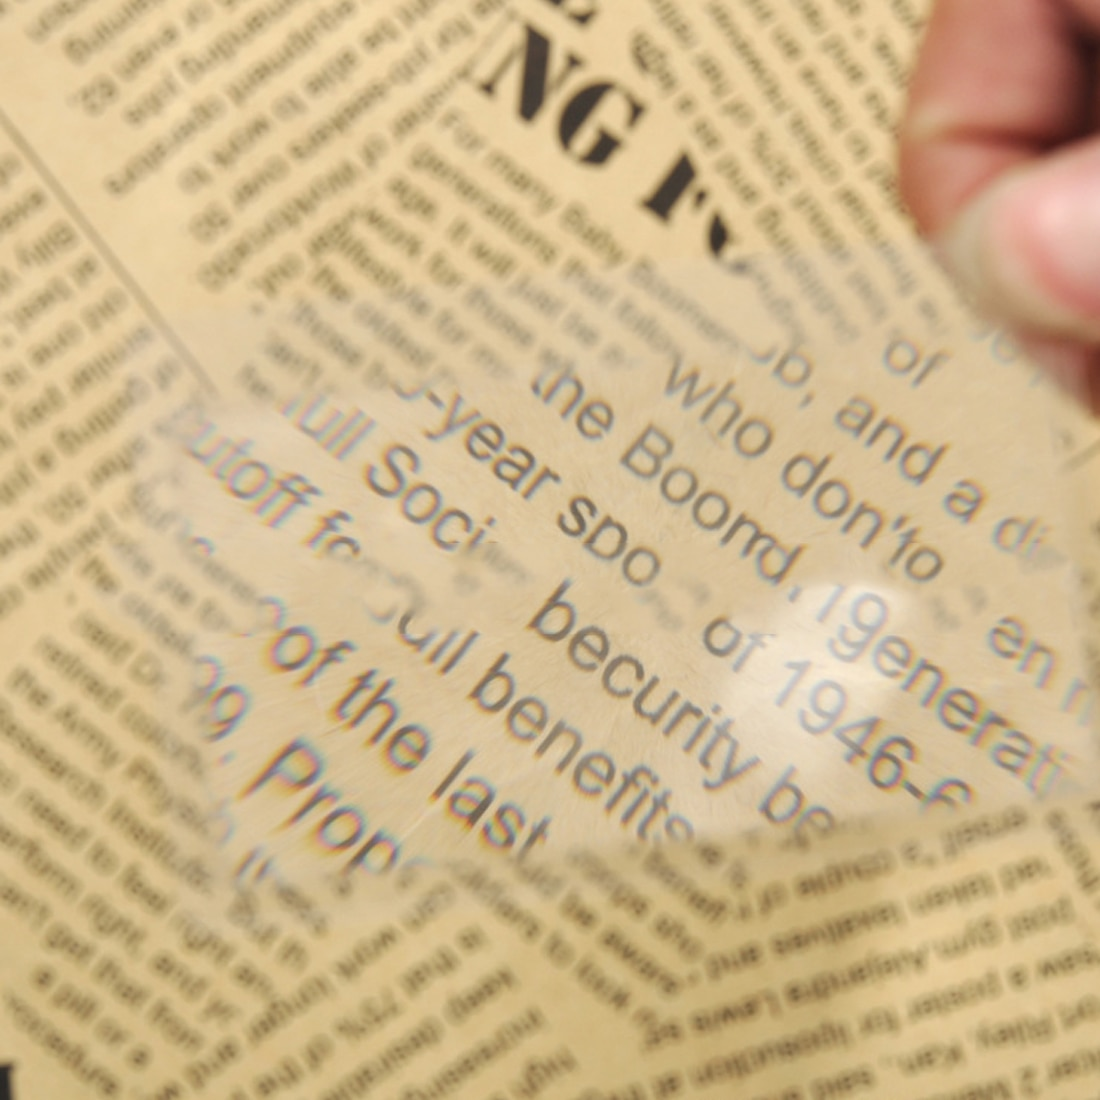 2 X Magnifier Magnification Magnifying Fresnel LENS 8.00*5.50*0.04cm Pocket Credit Card Size Transparent Magnifying Glass